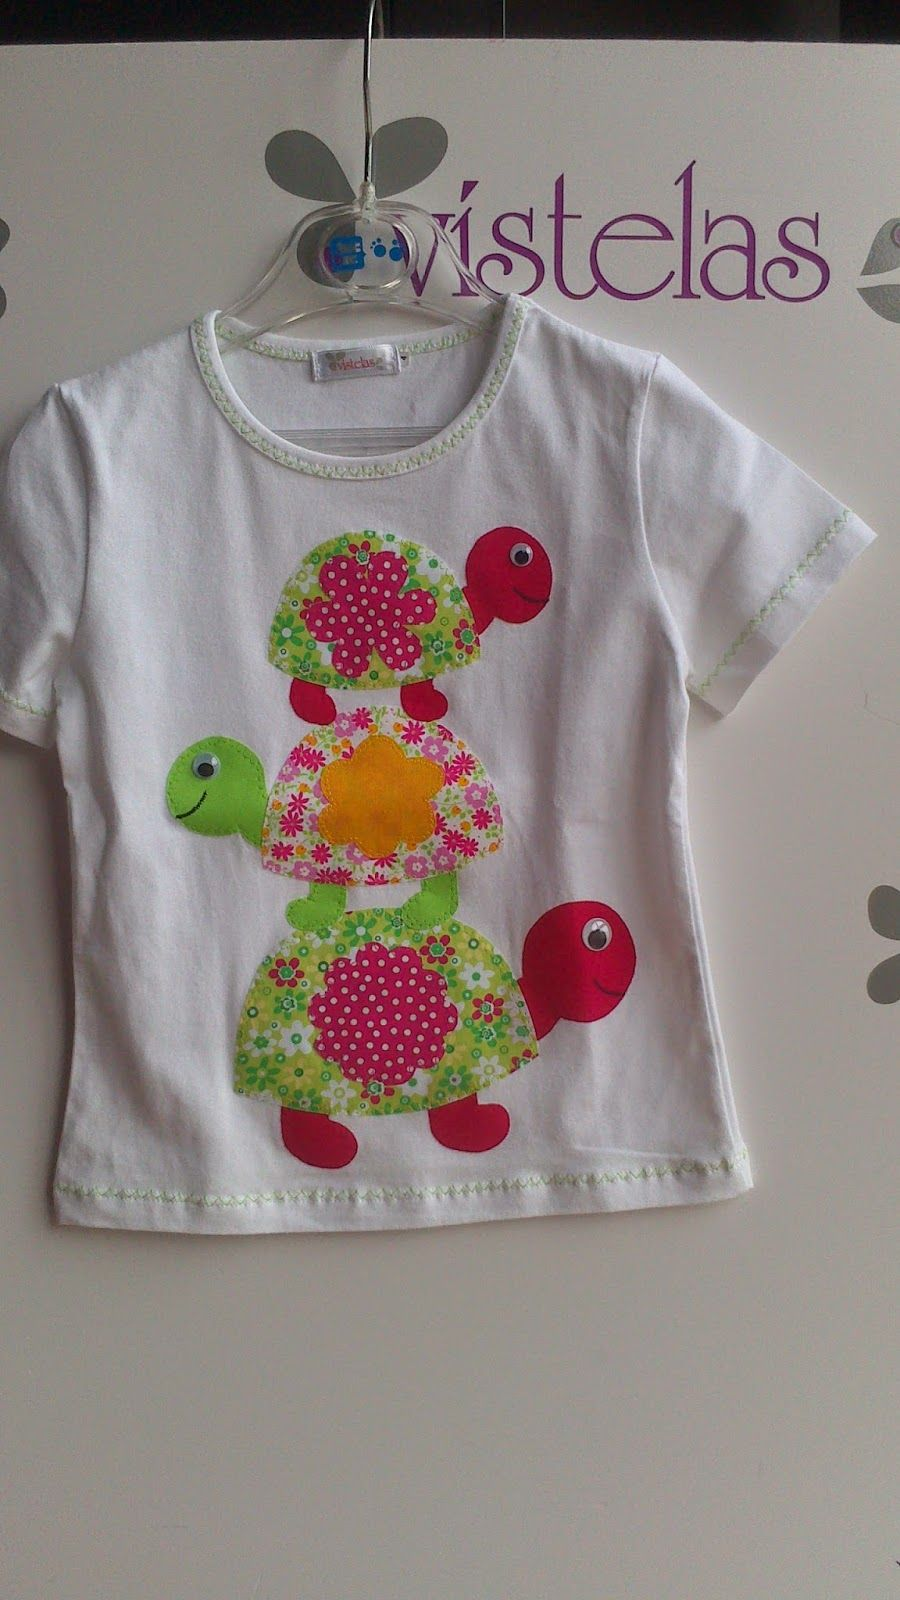 VISTELAS. Camiseta TORTUGAS | password | Pinterest | Applikationen ...